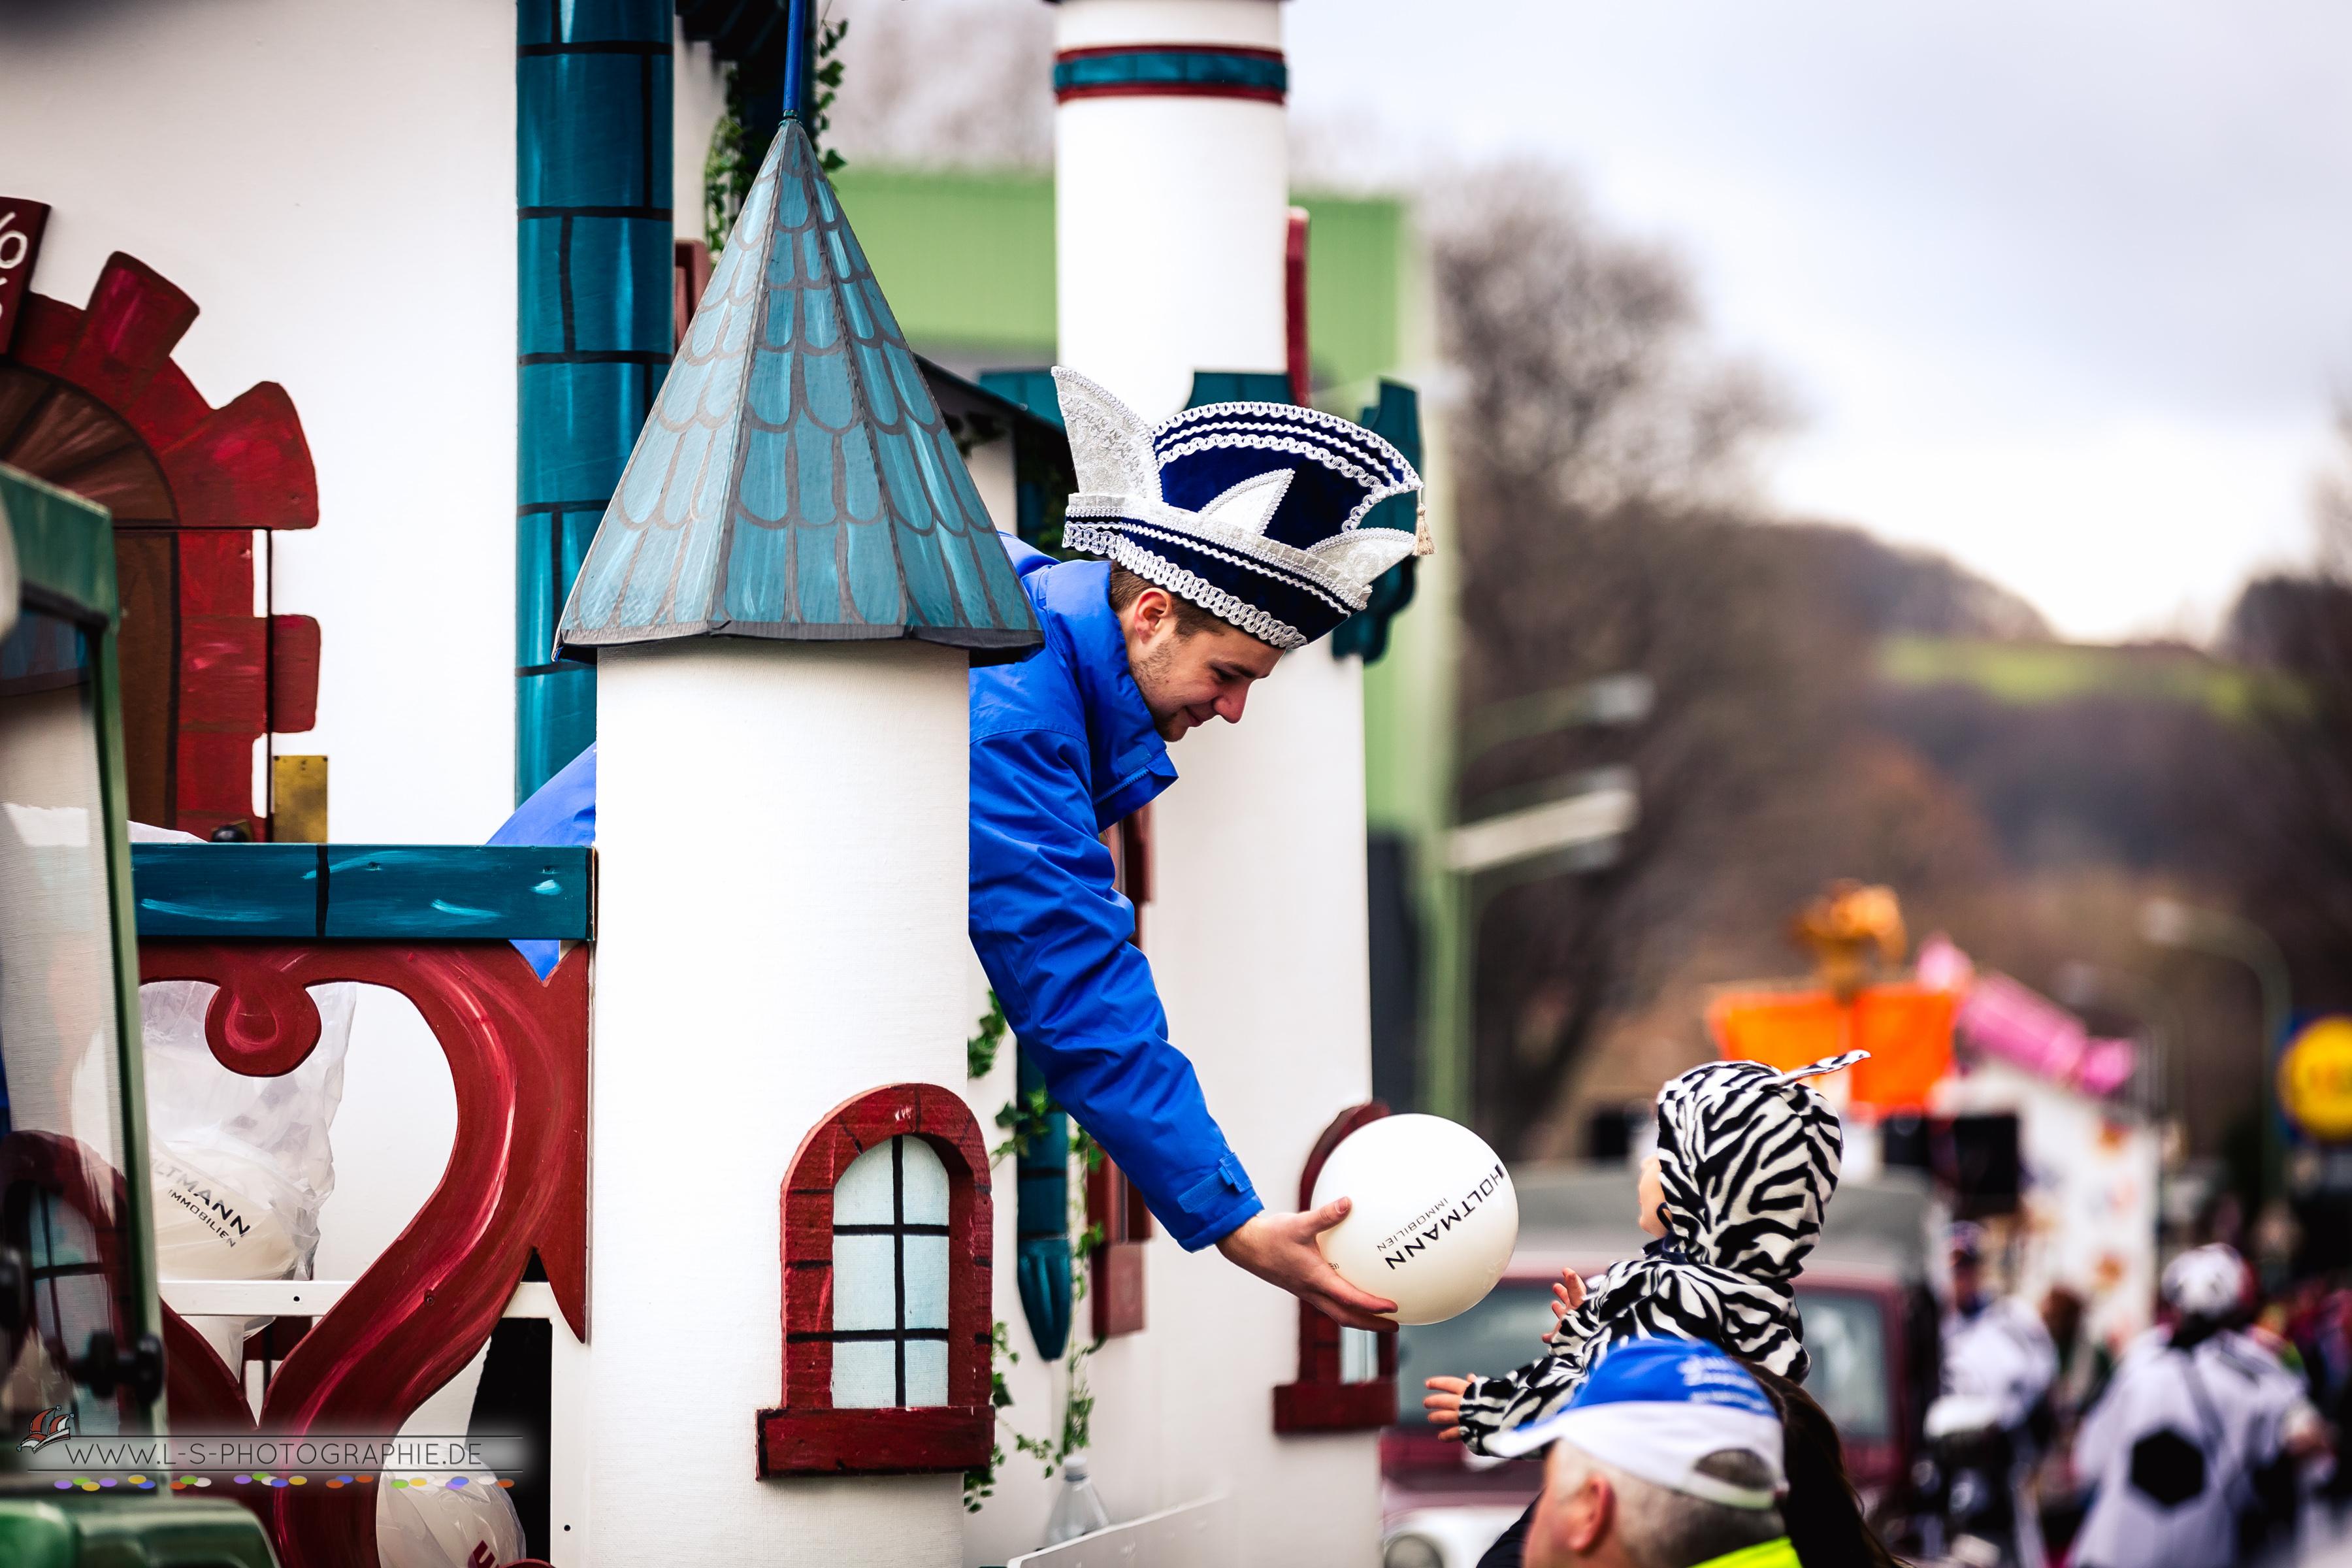 Karnevalszug in Kreuzau 2017 - LS Photographie Dueren Sebastian Lehmann